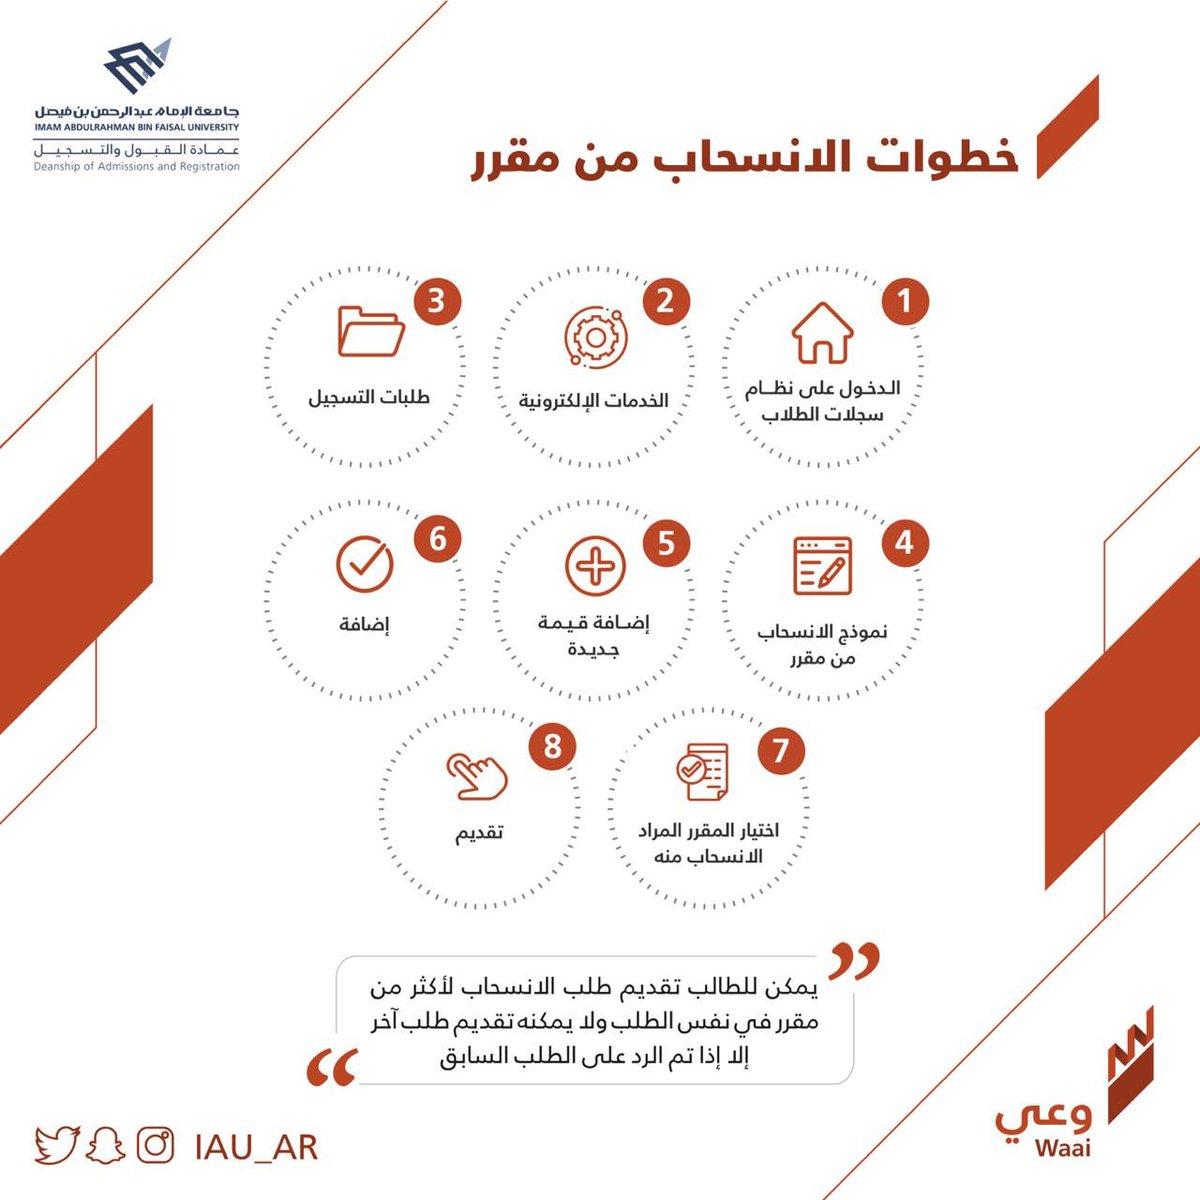 Dr Jamal Alhiyafi د جمال الحيافي Dralhiyafi Twitter